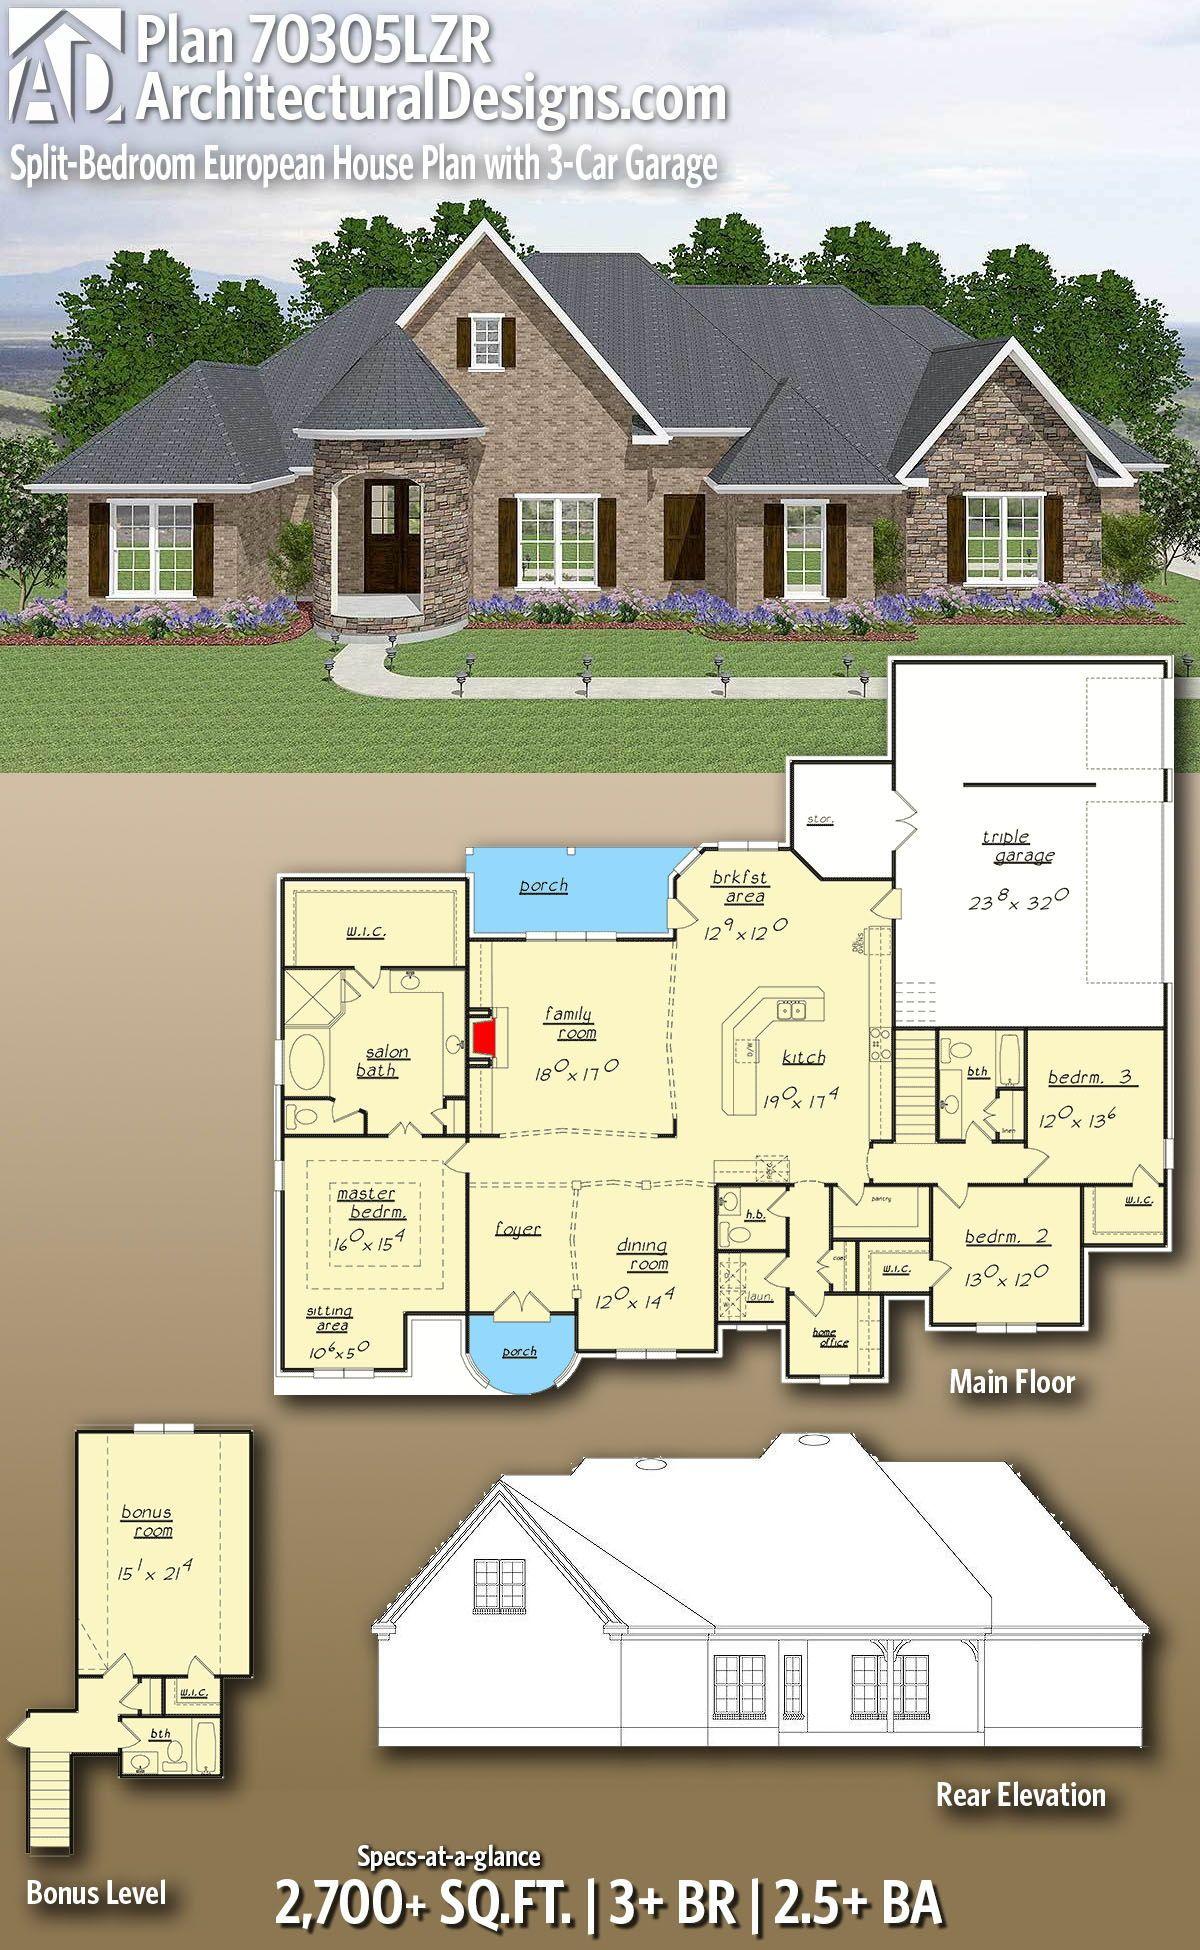 Plan 70305lzr Split Bedroom European House Plan With 3 Car Garage House Plans Country House Plans European House